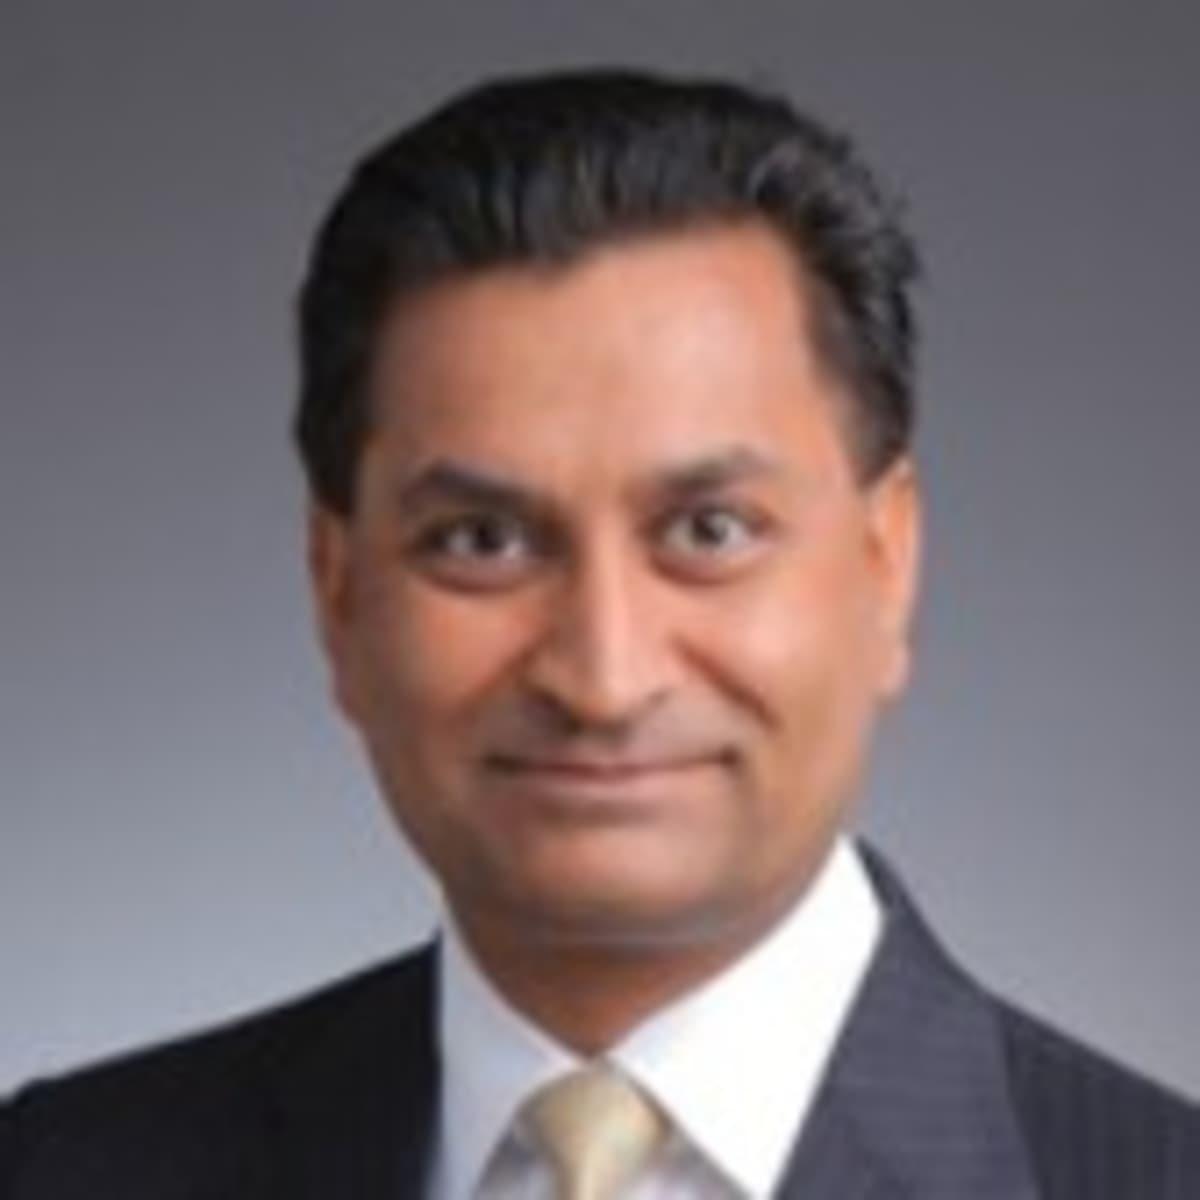 Video Dr Amit Patel Md Morristown Nj Vascular Surgeon